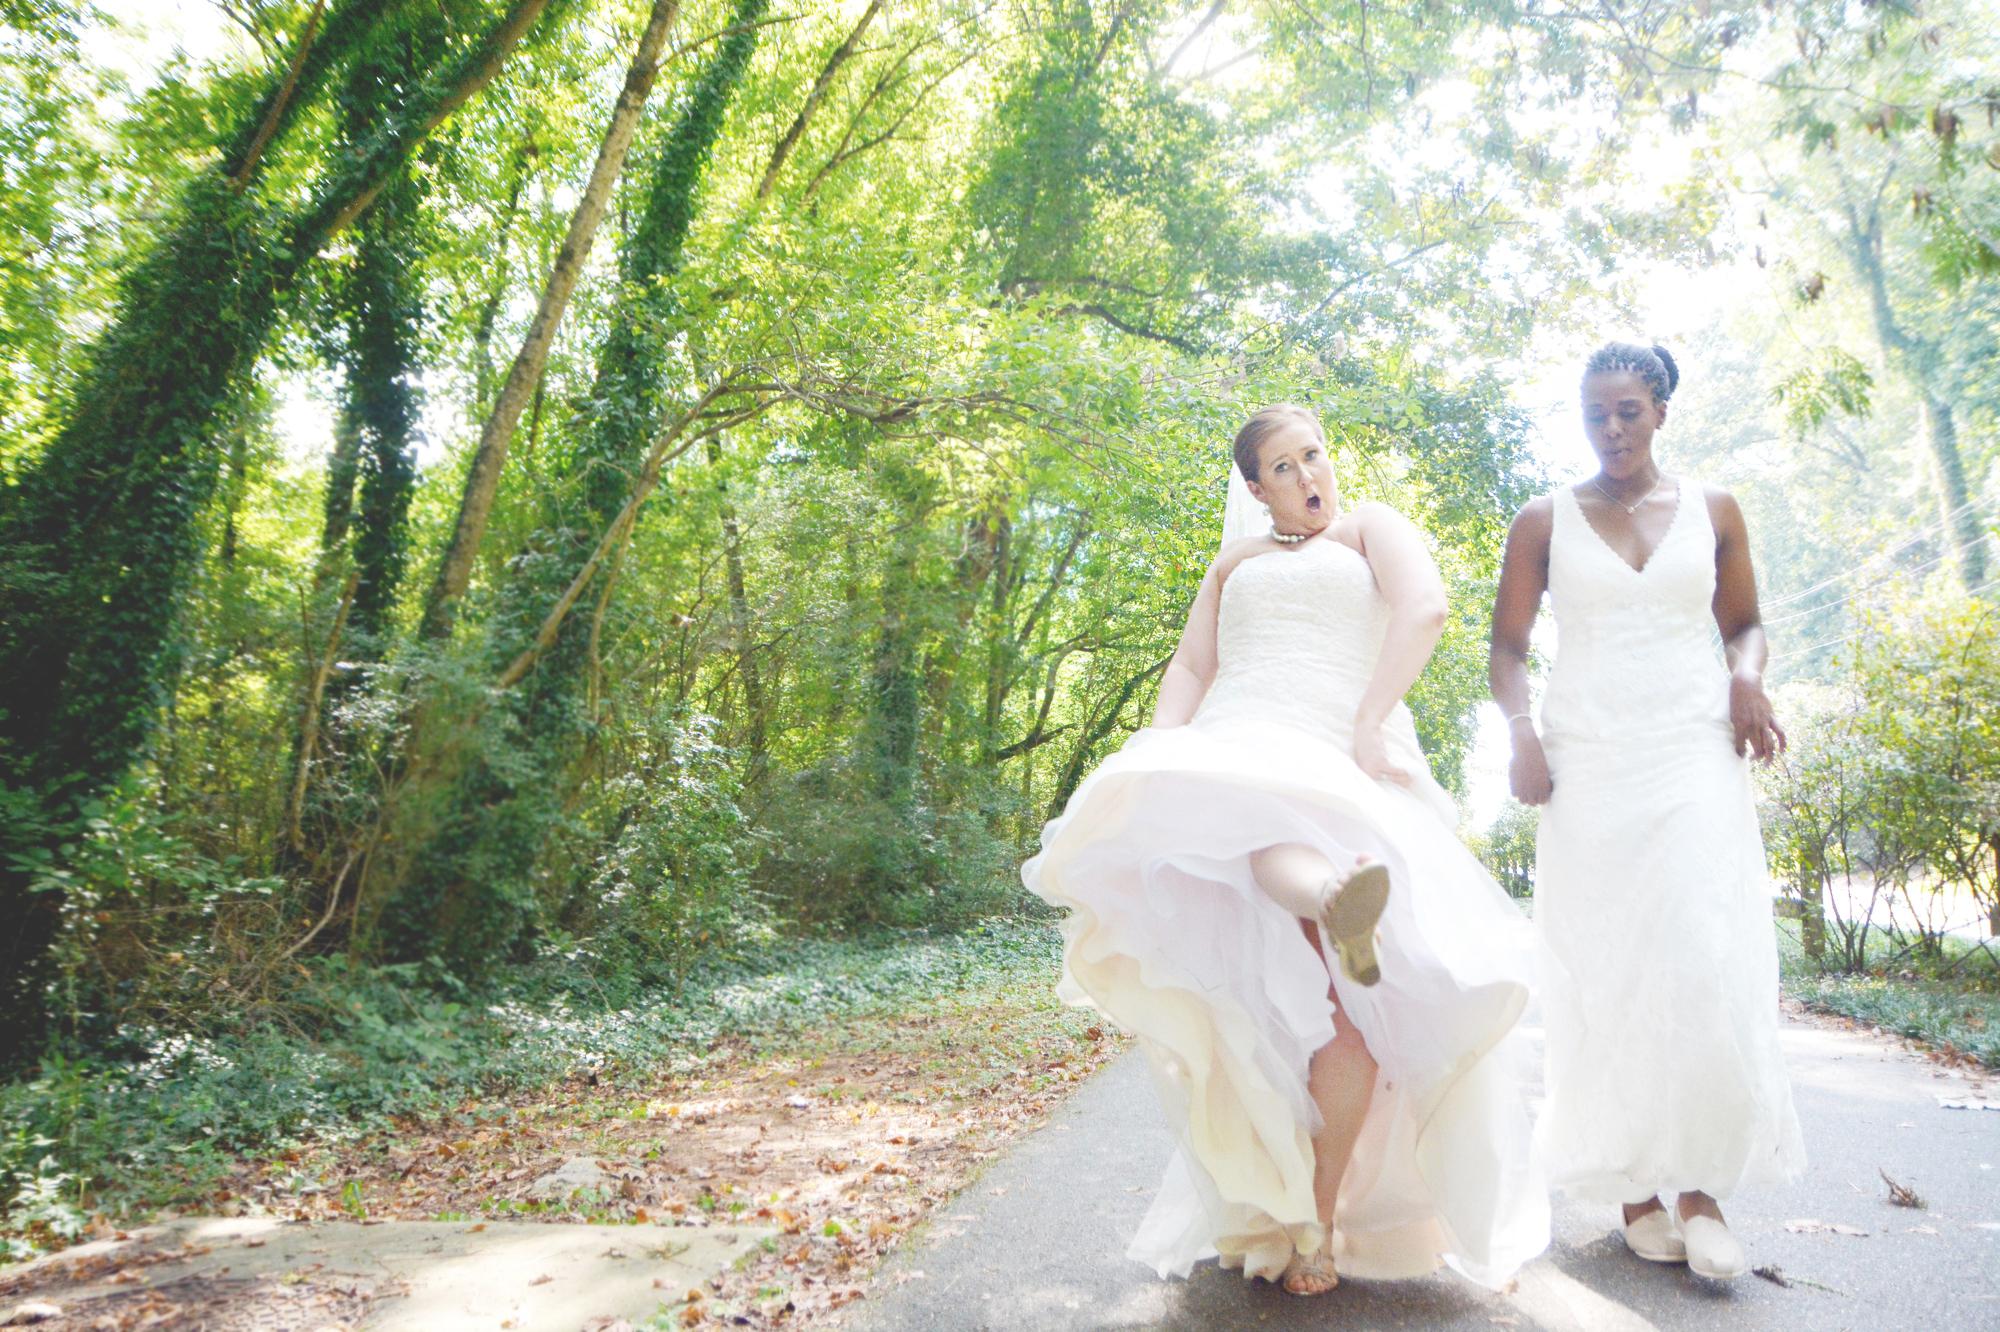 interracial-same-sex-wedding-six-hearts-photography-18